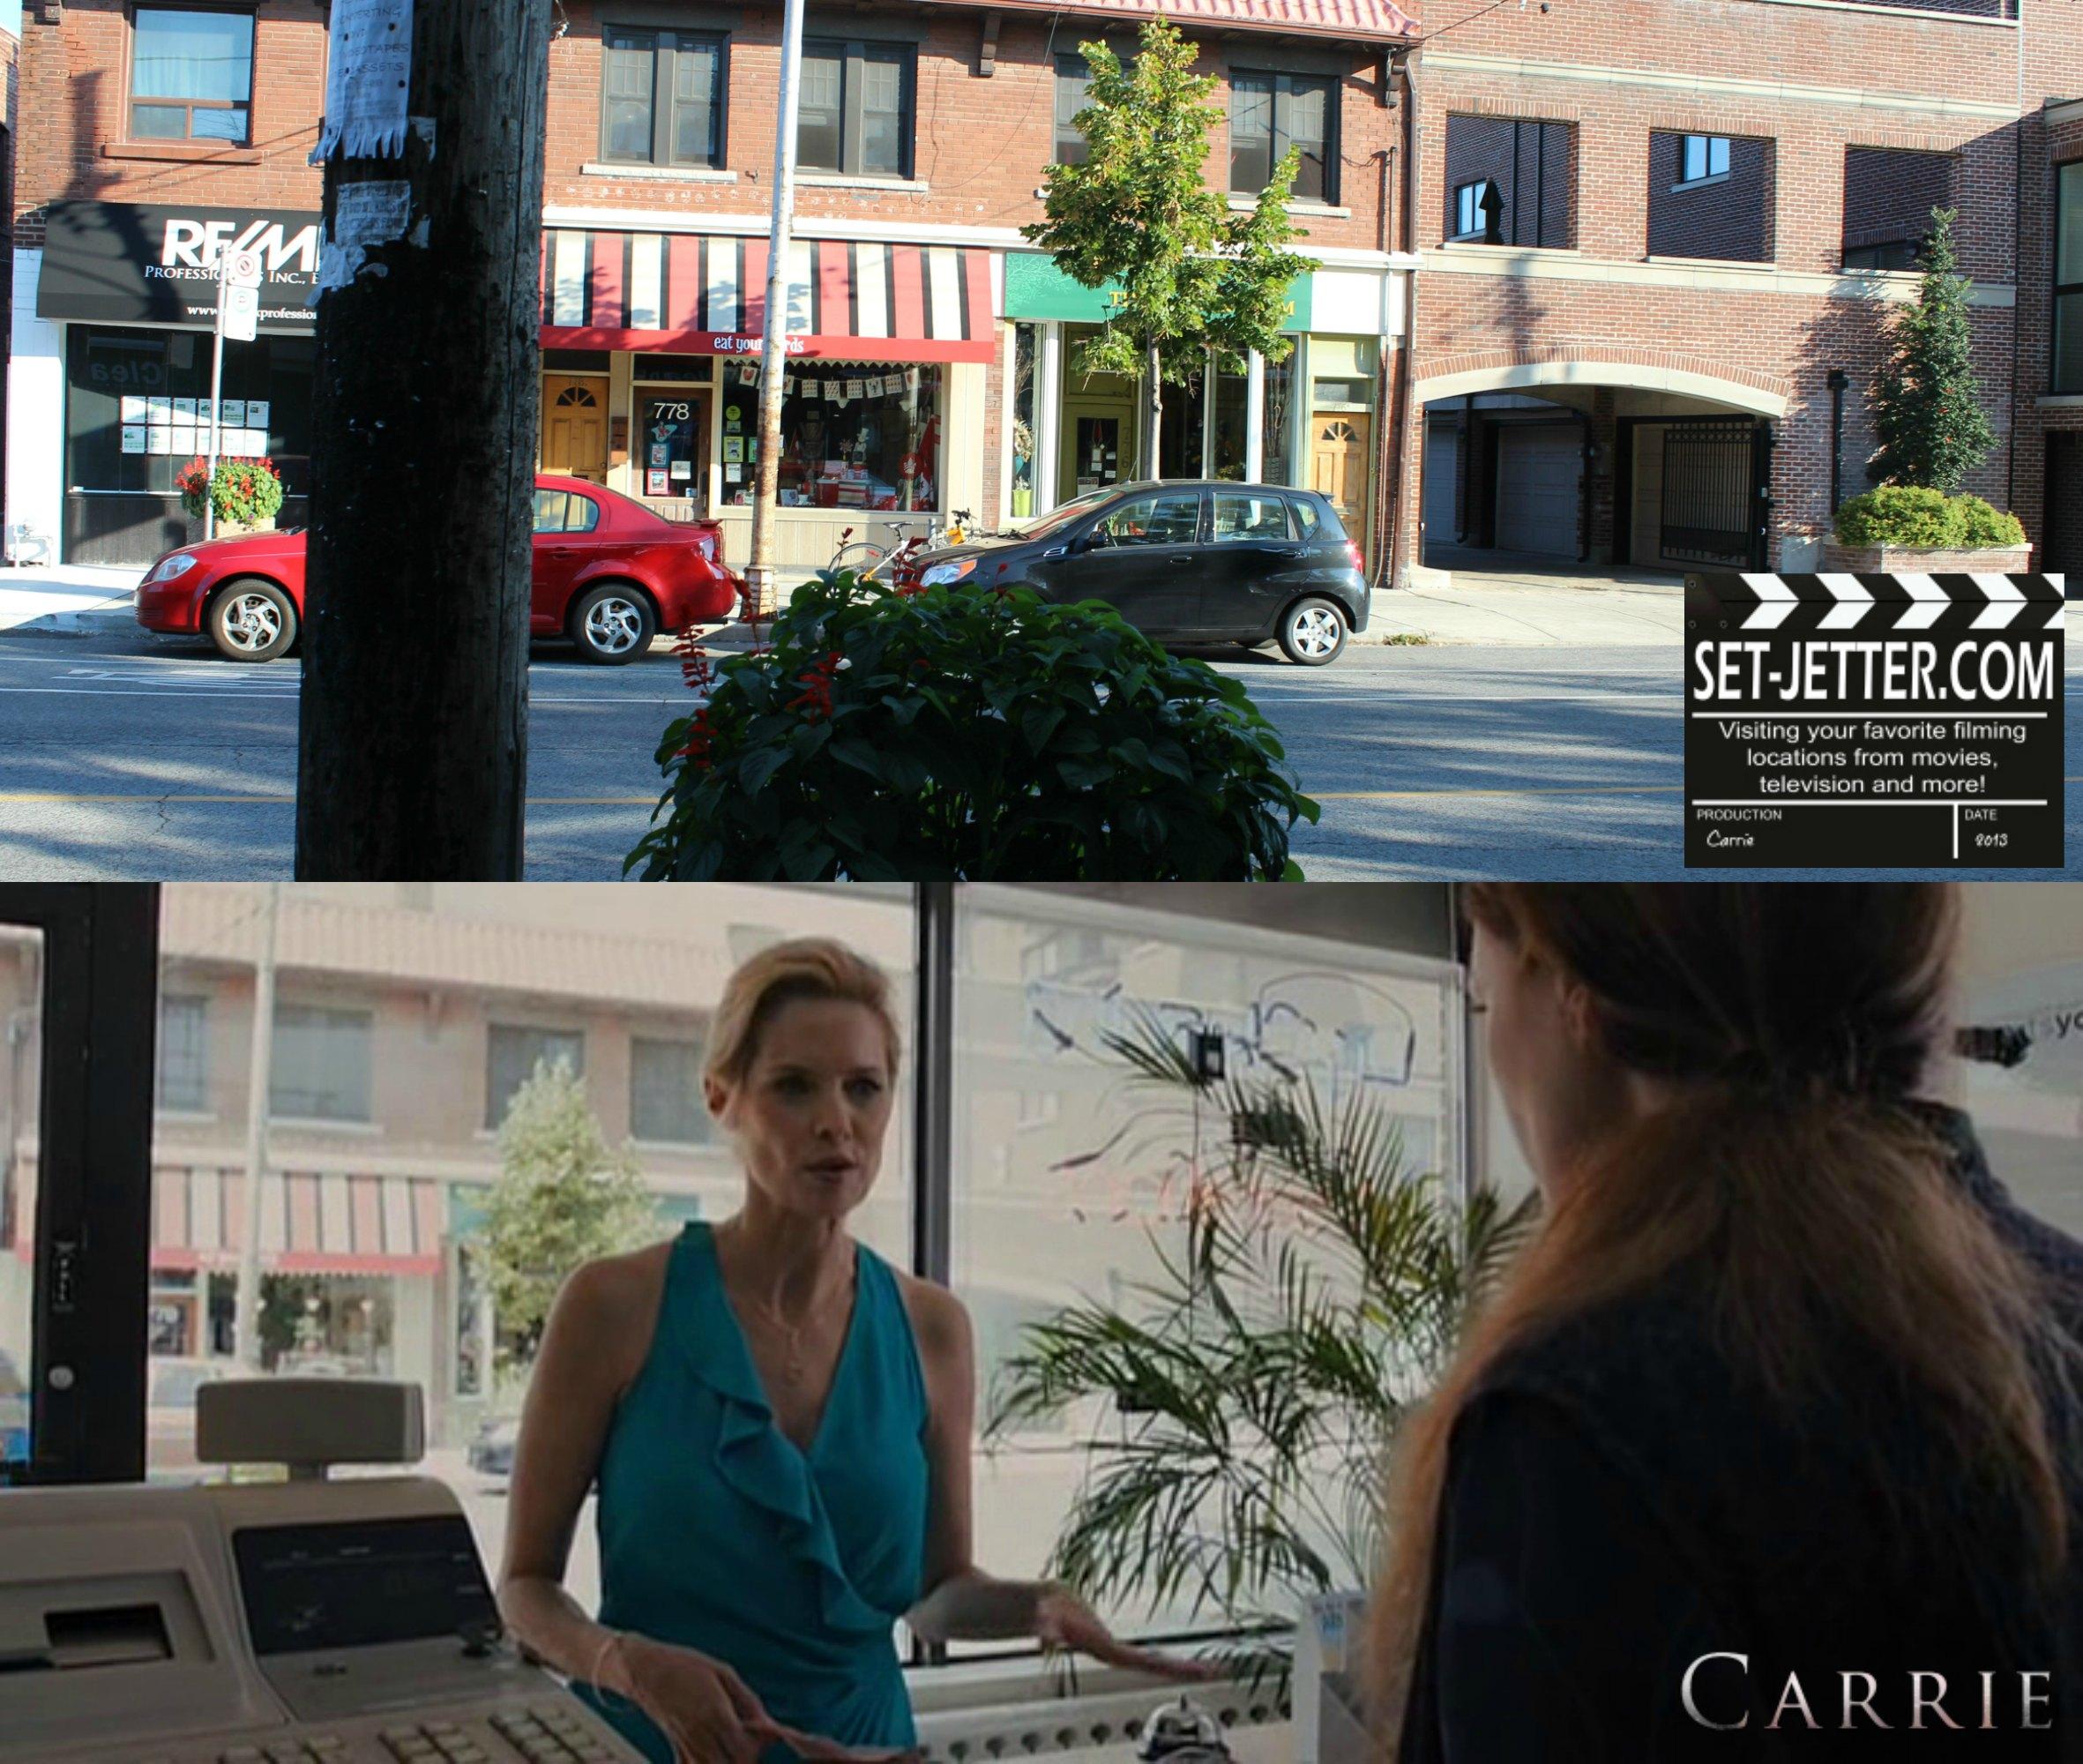 Carrie 2013 comparison 142.jpg